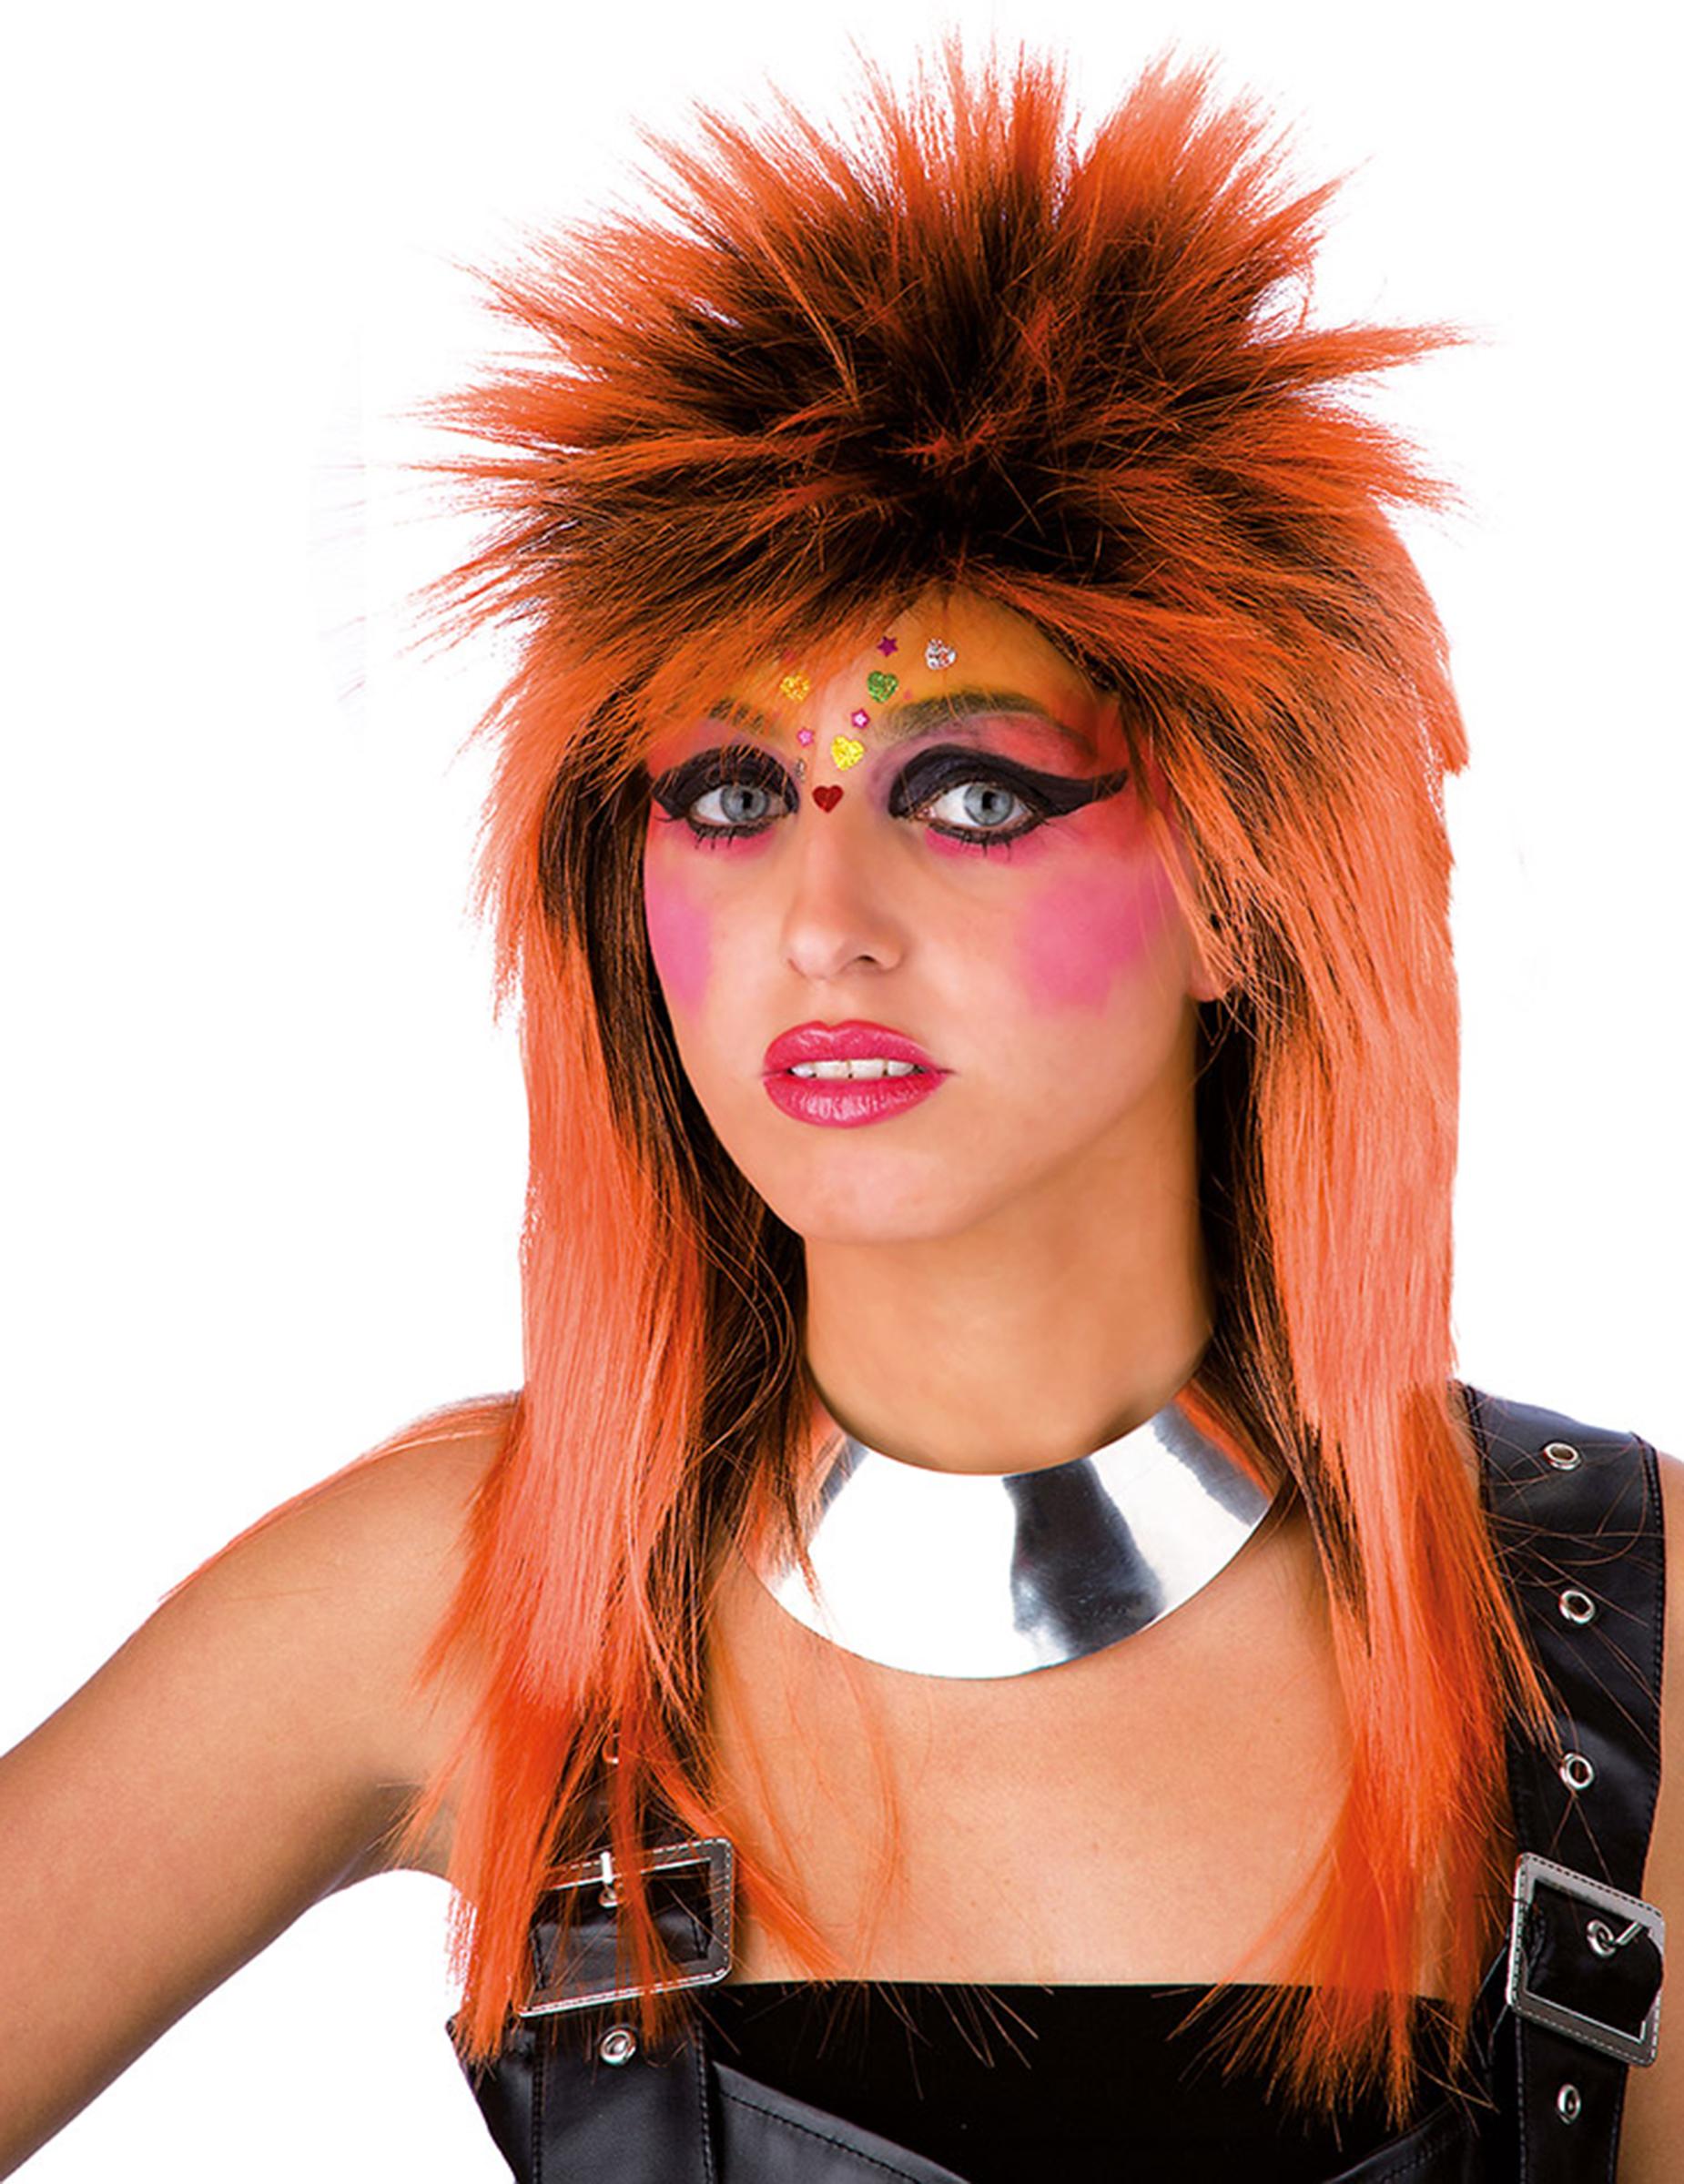 082d834ae5 Perruque punk orange adulte : Deguise-toi, achat de Perruques